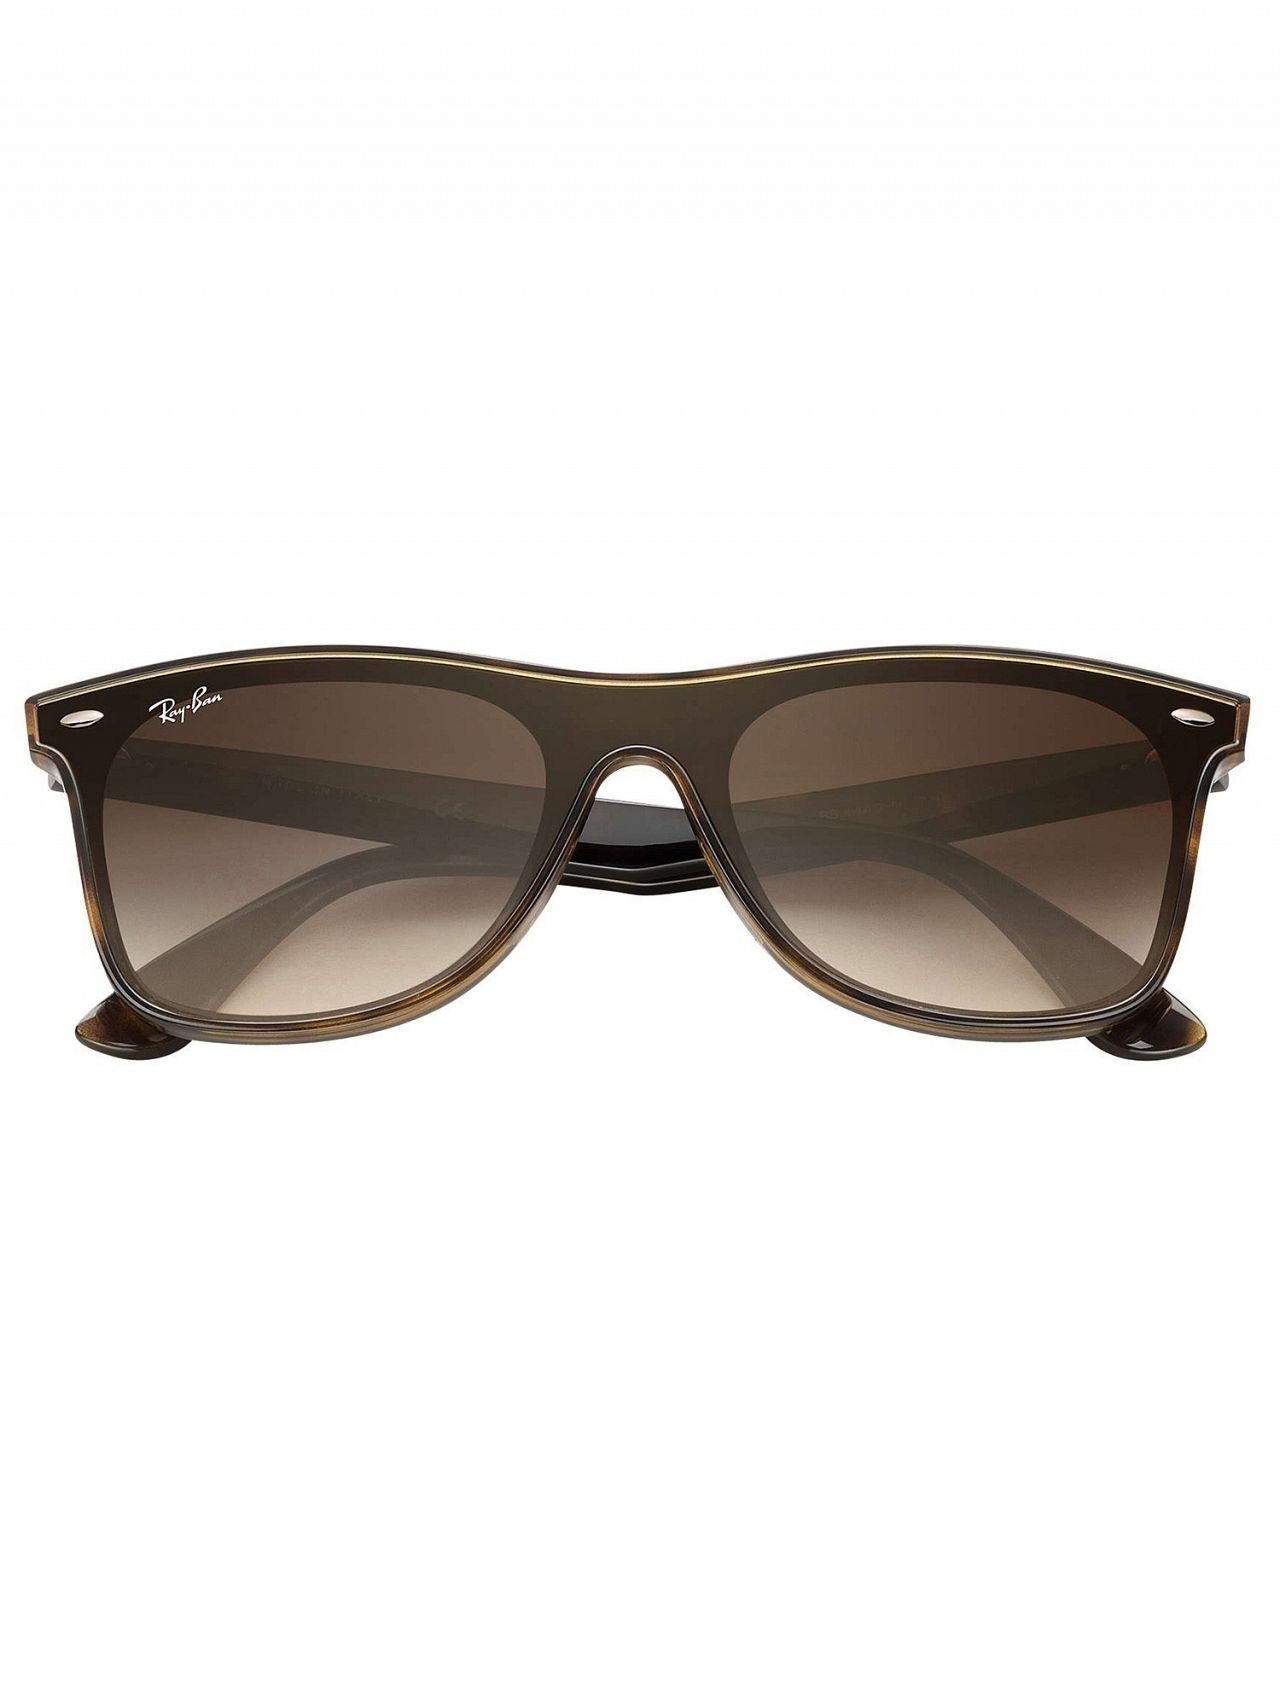 f7758d7f01 Ray-Ban Tortoise RB4440N Blaze Wayfarer Sunglasses